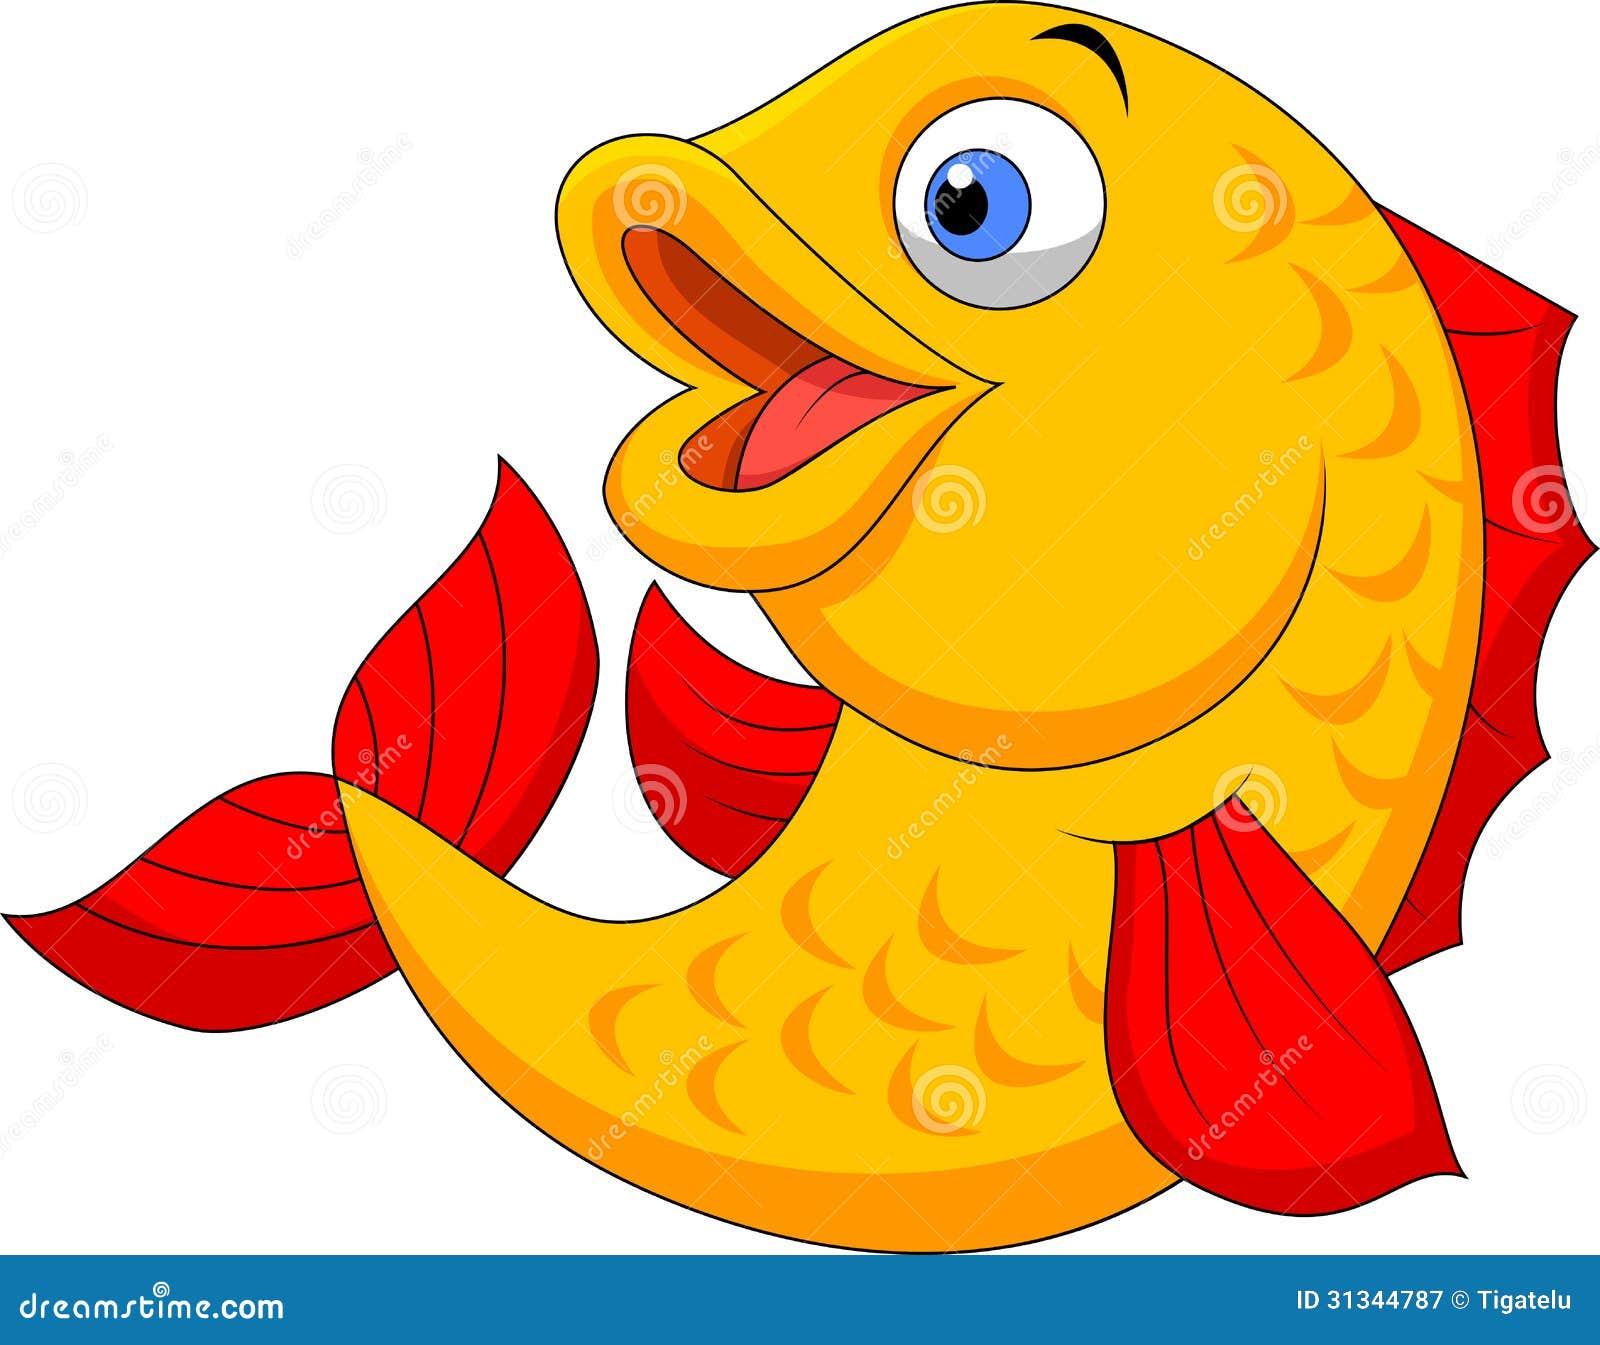 Cute Fish Cartoon Waving Stock Vector. Illustration Of